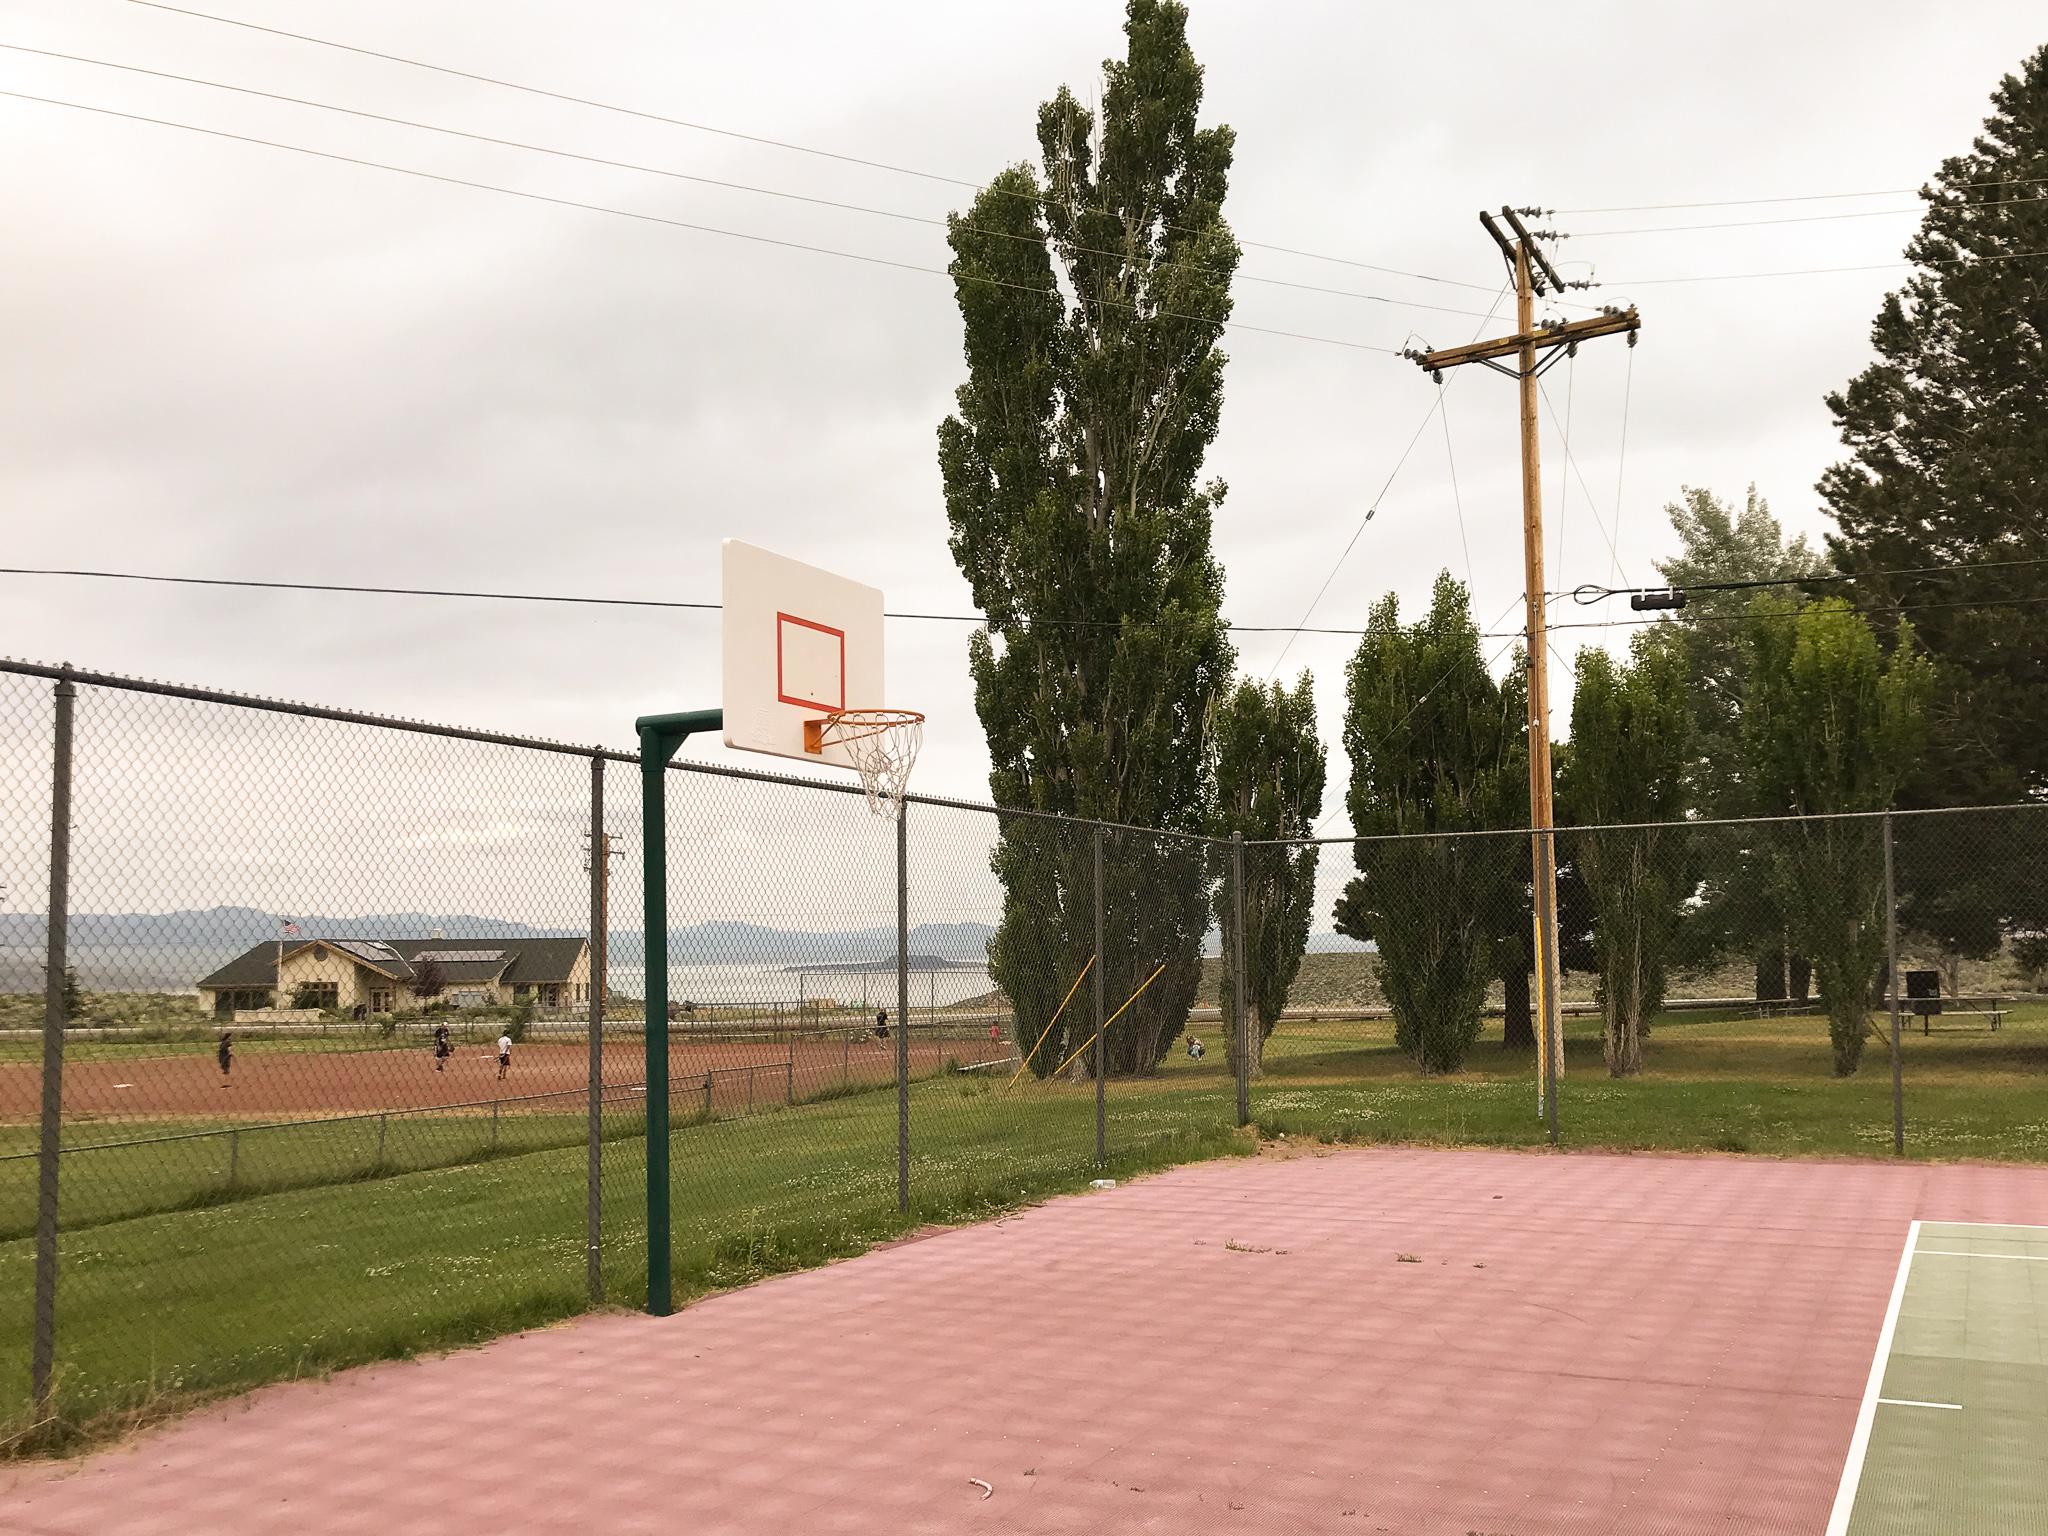 Gus Hess Community Park basketball hoop